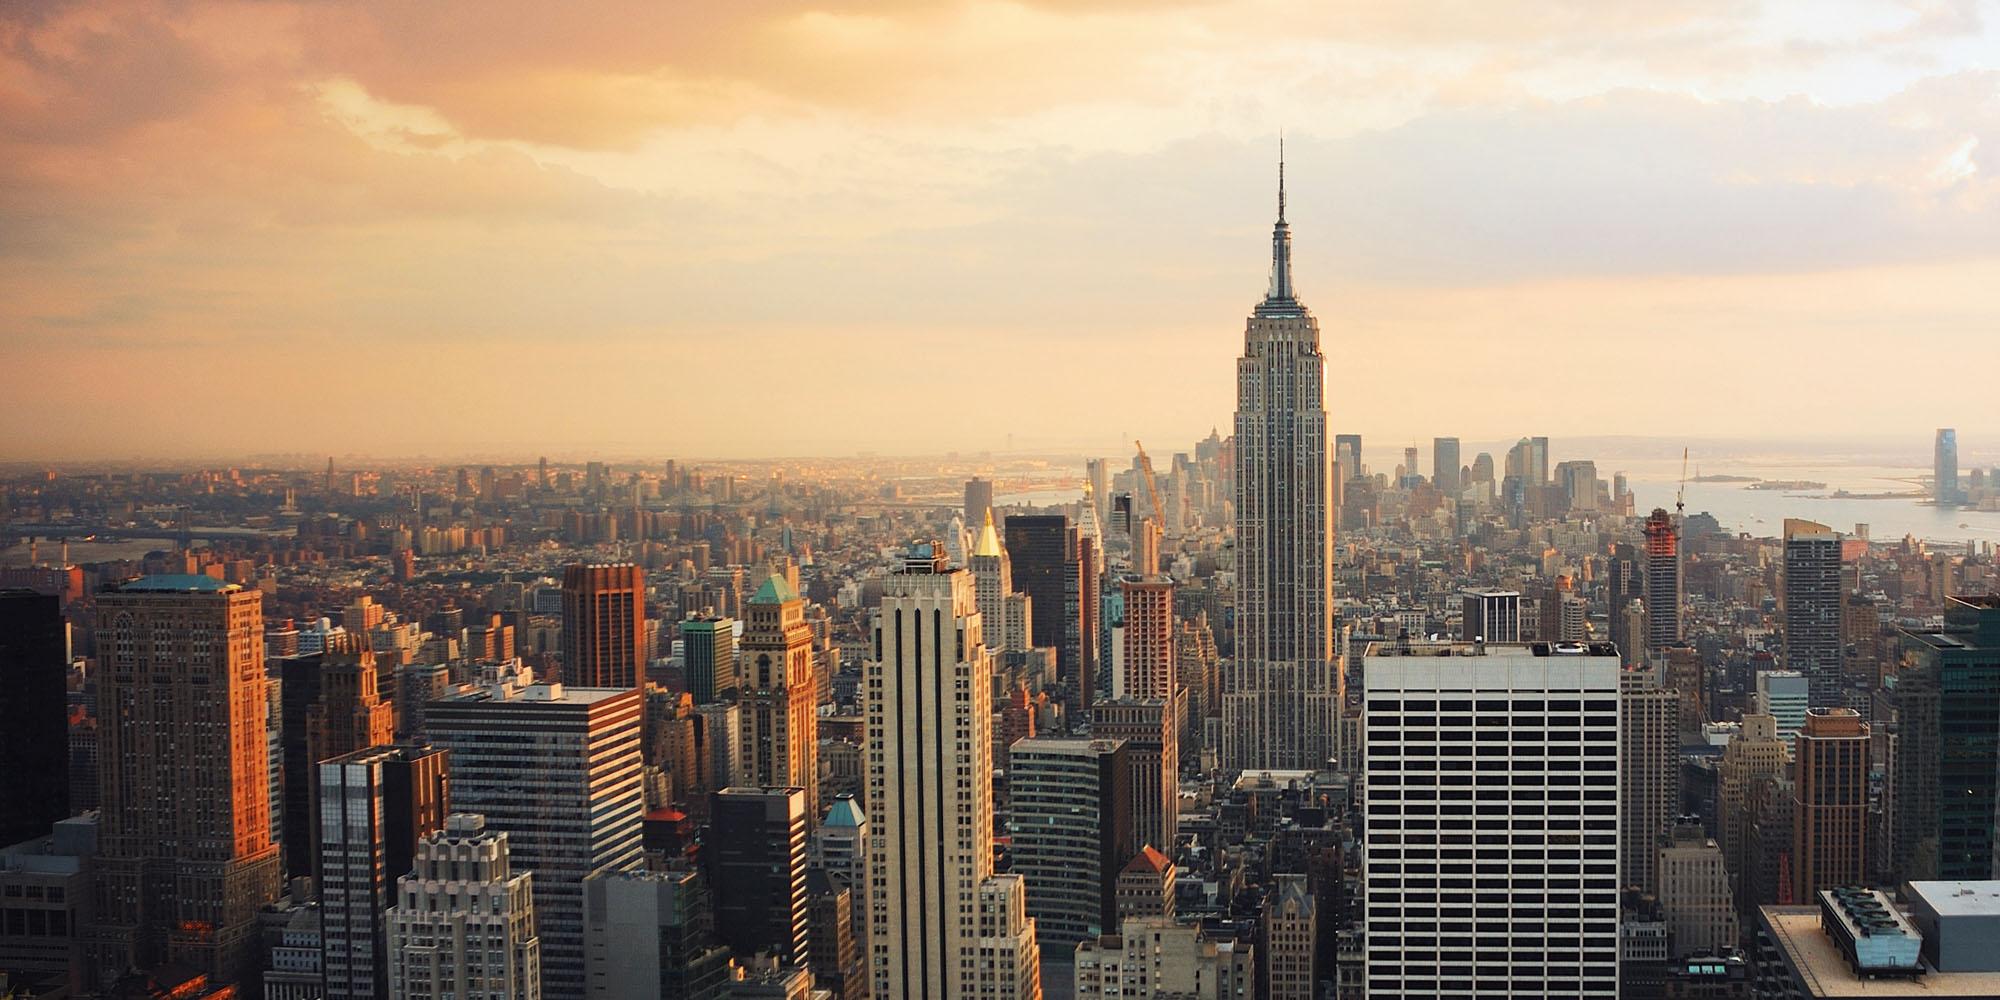 hilton-new-york-hotel-021.jpg